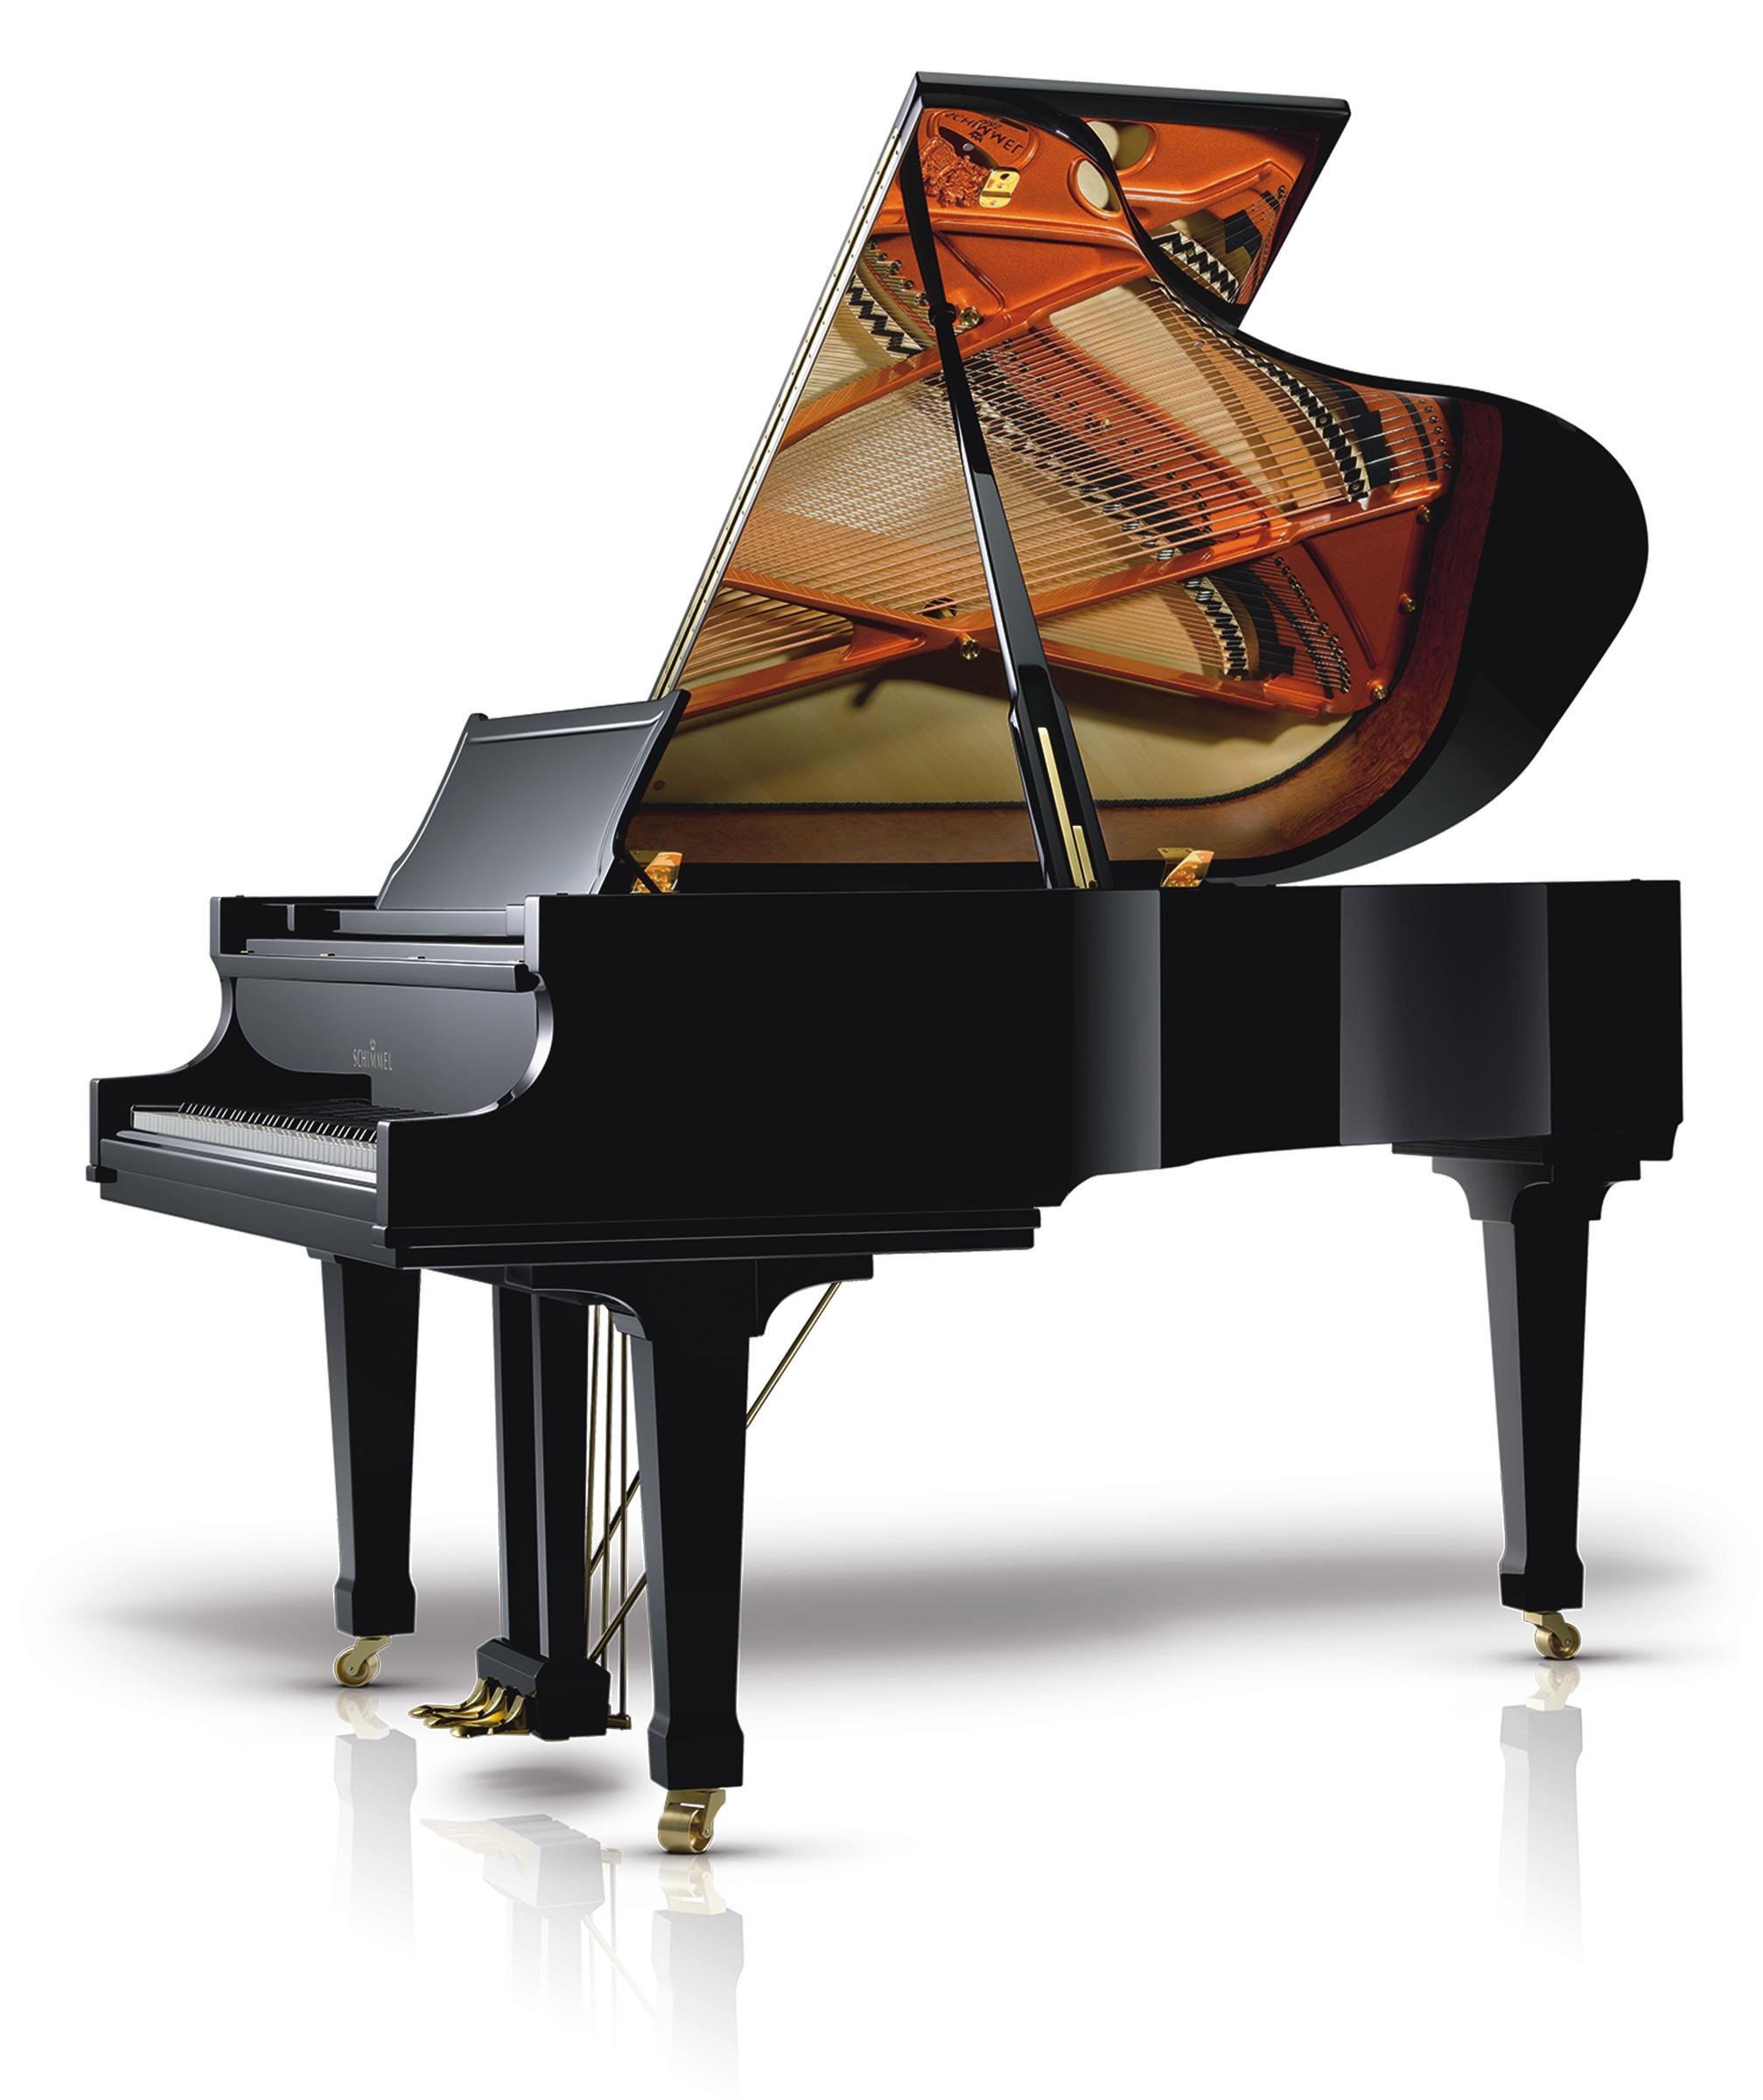 Yamaha Classic Collection Grand Piano